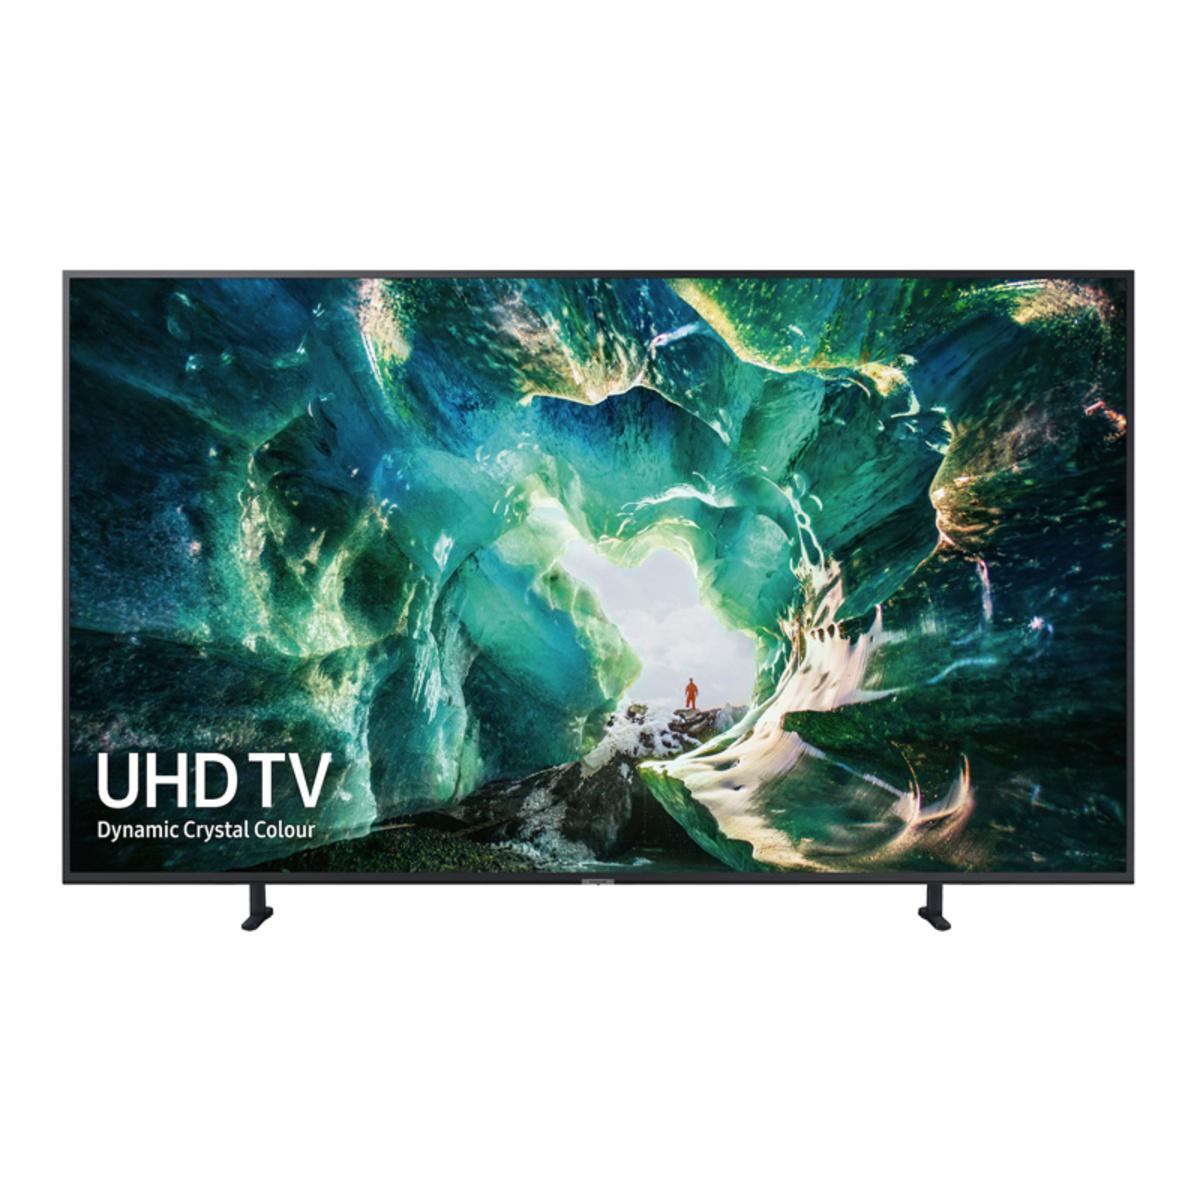 Samsung UE65RU8000 65 inch 4K Ultra HD HDR Smart LED TV with Apple TV app £749 @ PRC Direct